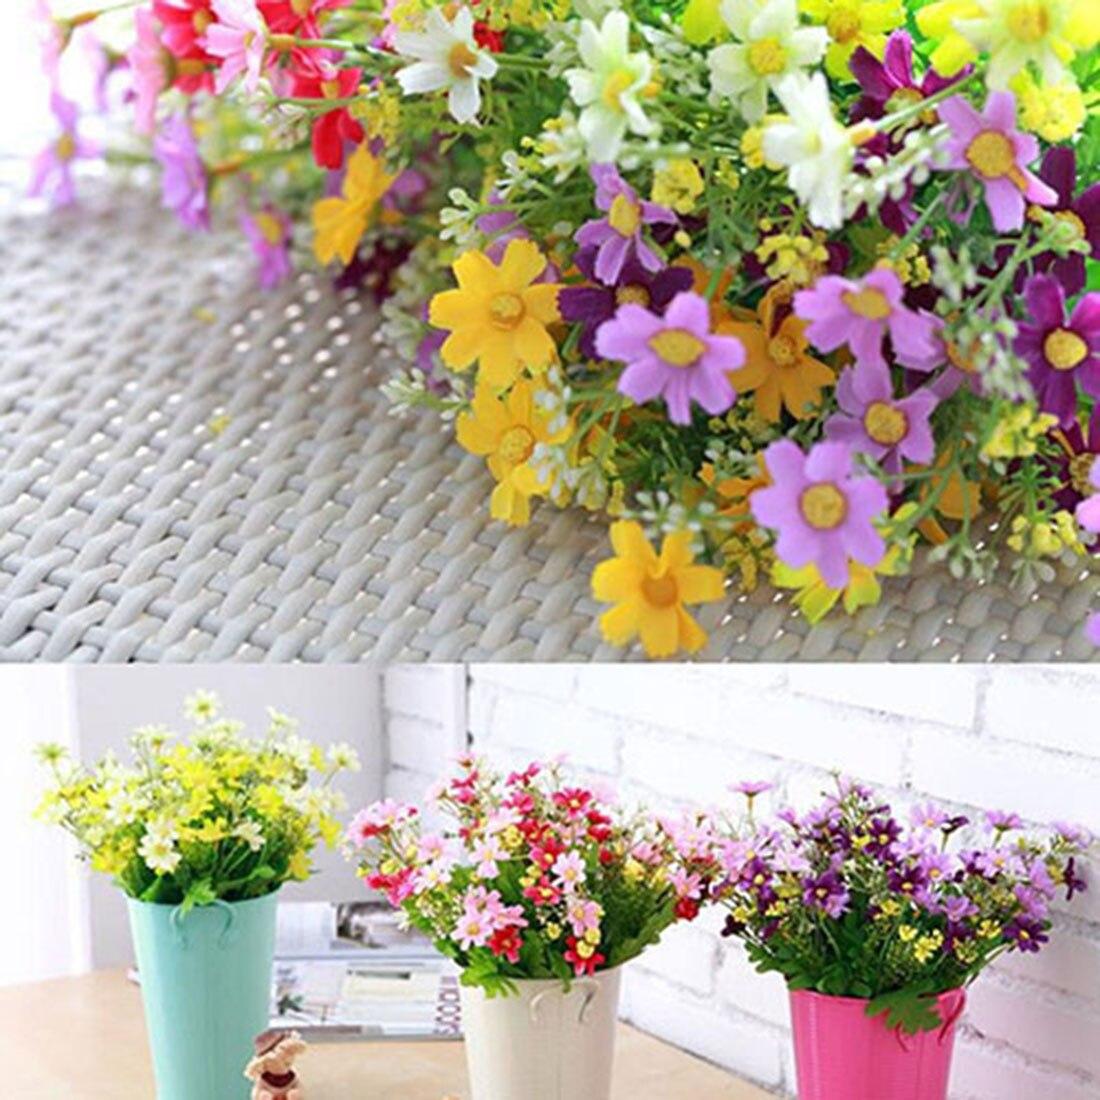 Big Sale 1 Bouquet 28 Heads Fake Daisy Artificial Silk Flower Home